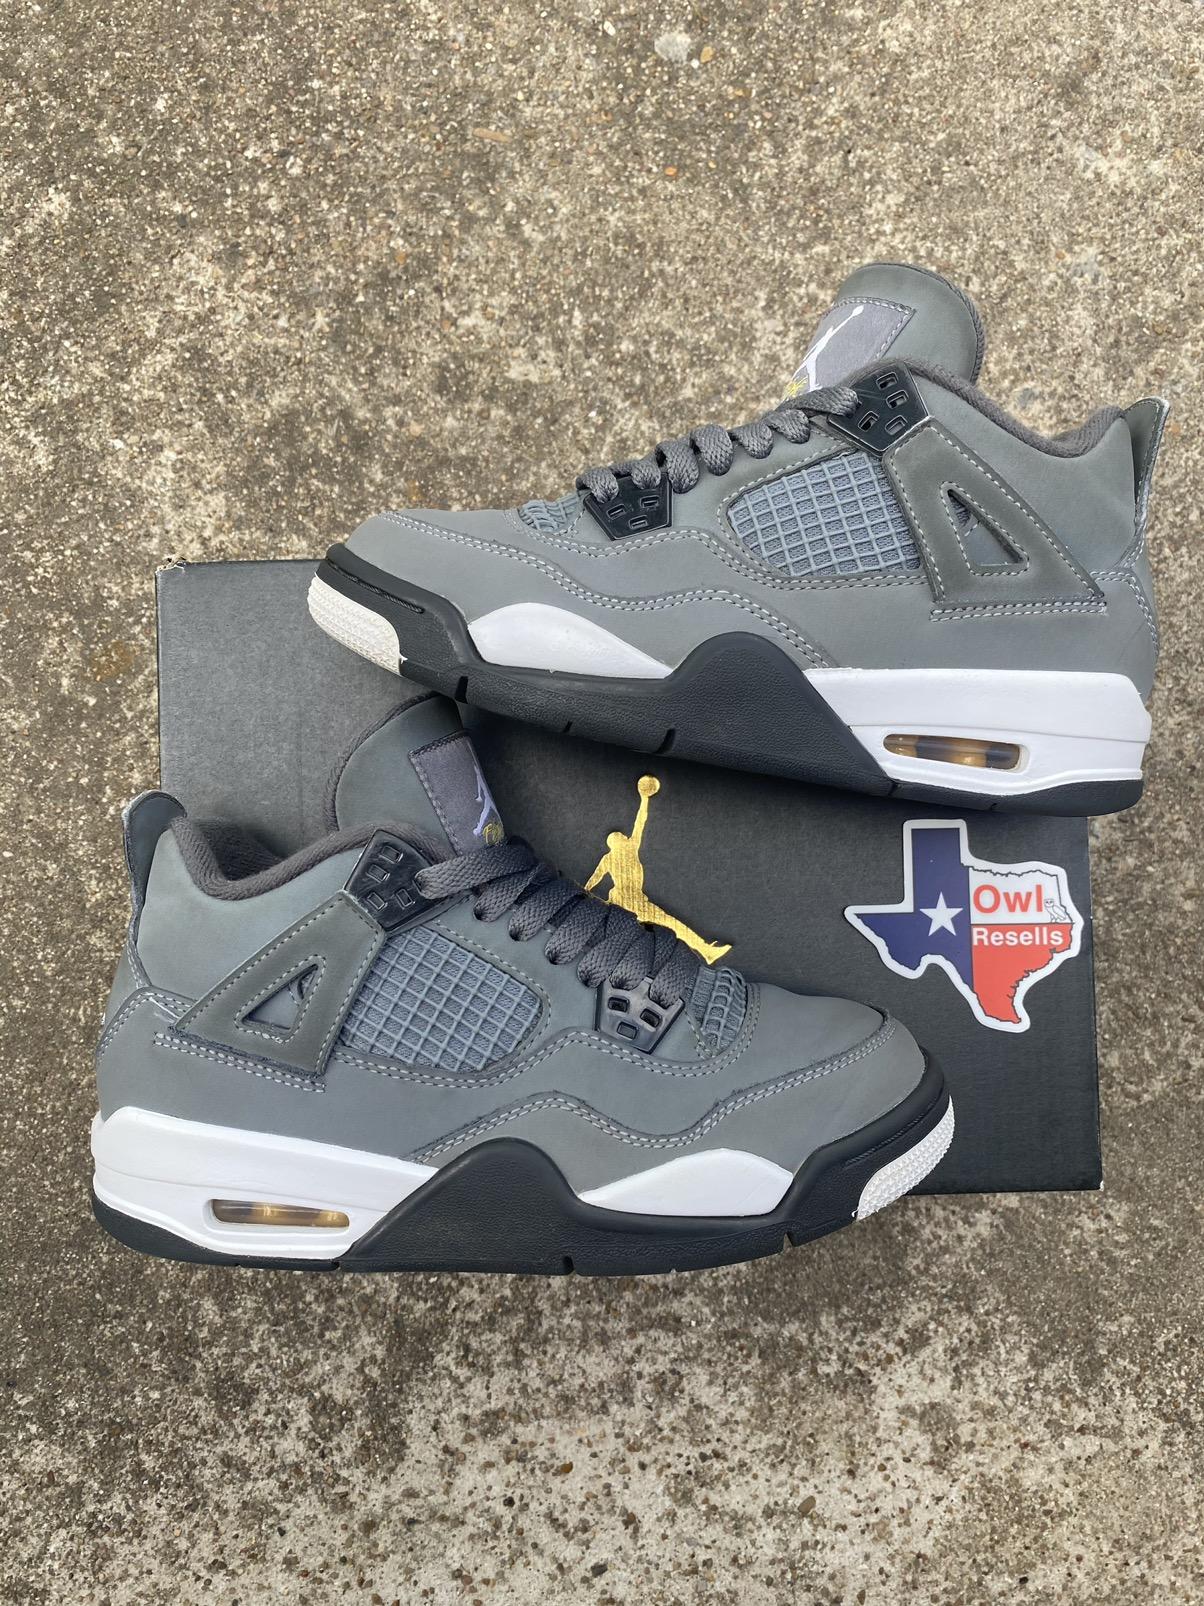 Nike Air Jordan 4 Retro GS Cool Grey 2019 4Y